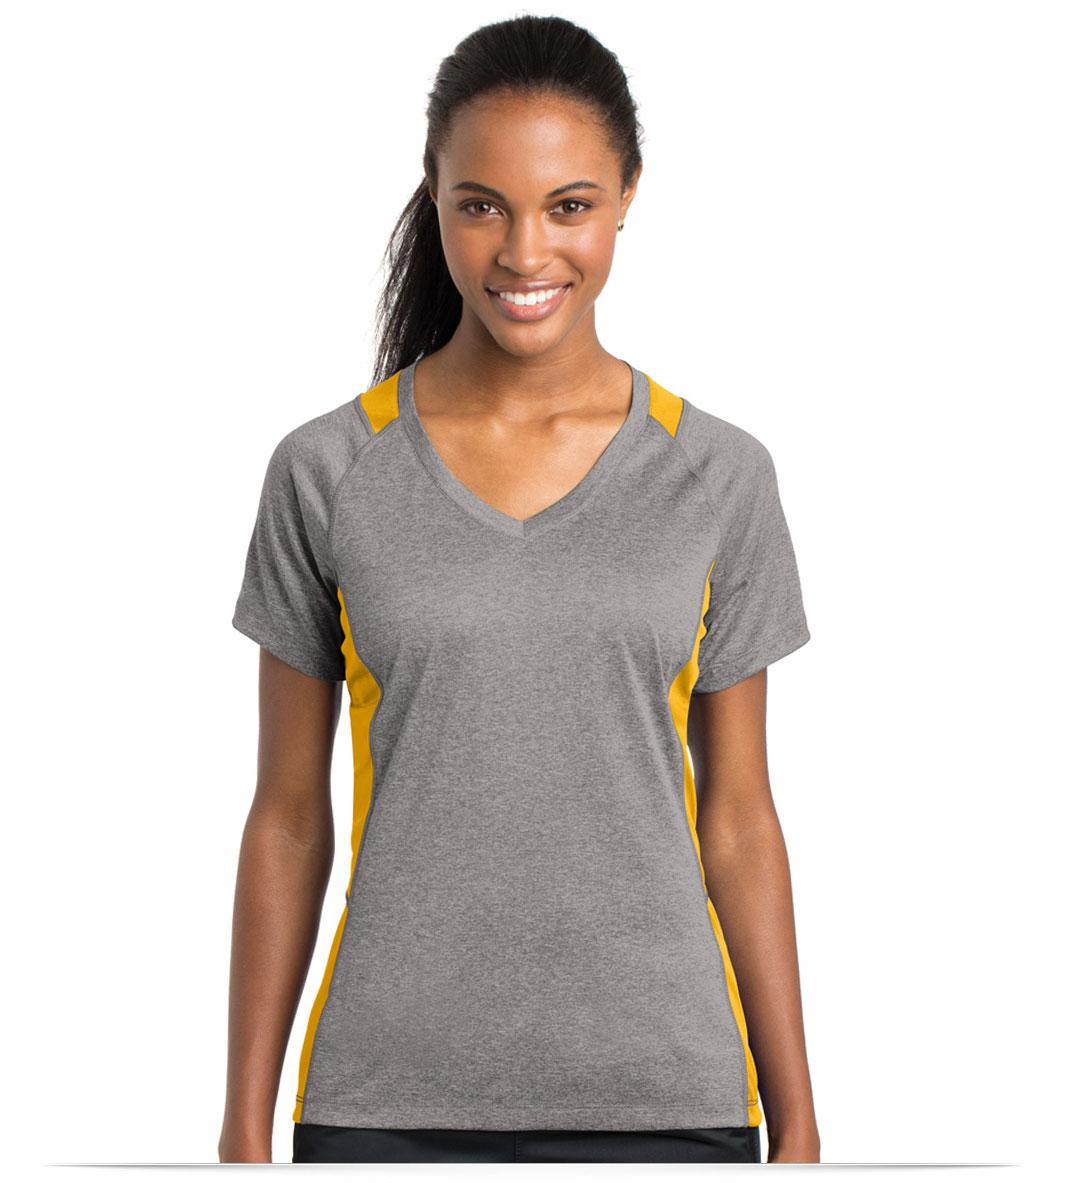 Embroidered Sport-Tek Ladies Colorblock V-Neck Tee